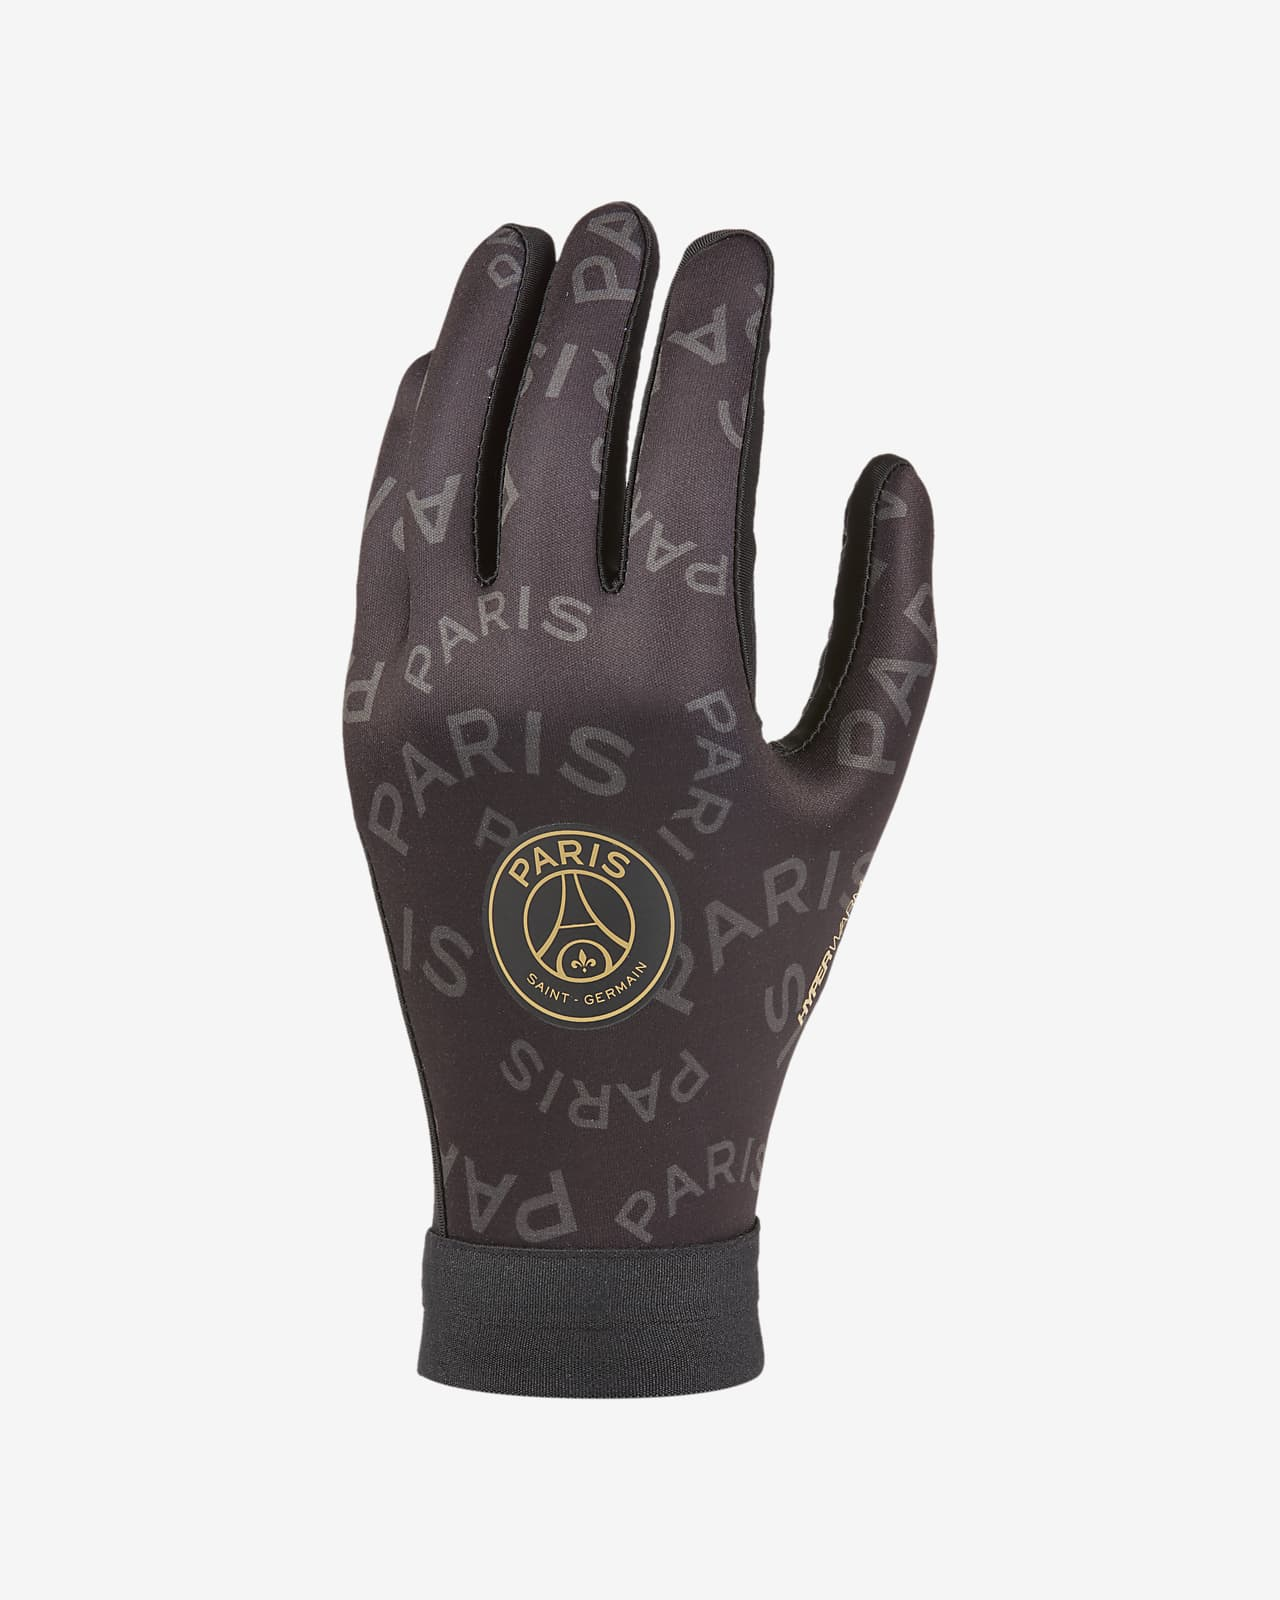 Brankářské rukavice Jordan x Paris Saint-Germain HyperWarm